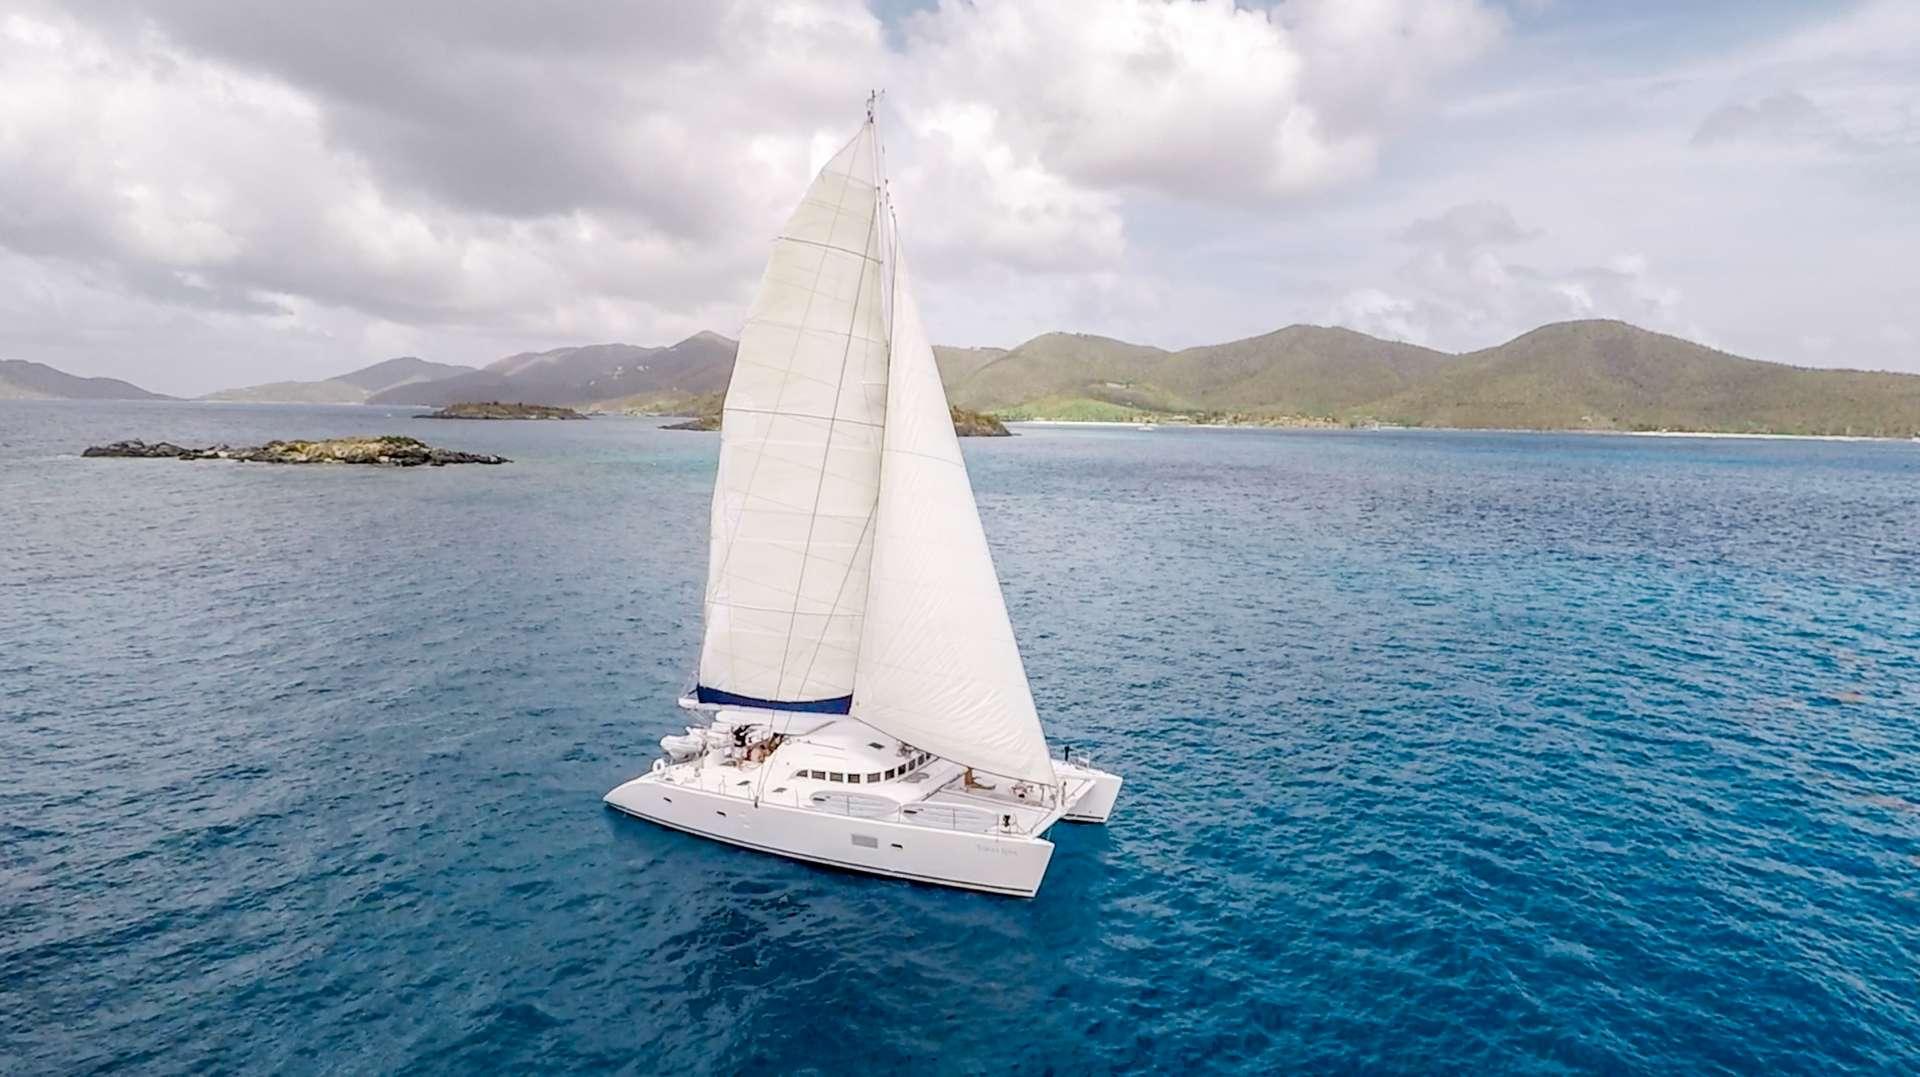 Tabula Rasa 57ft Lagoon S-Y Catamaran at sea